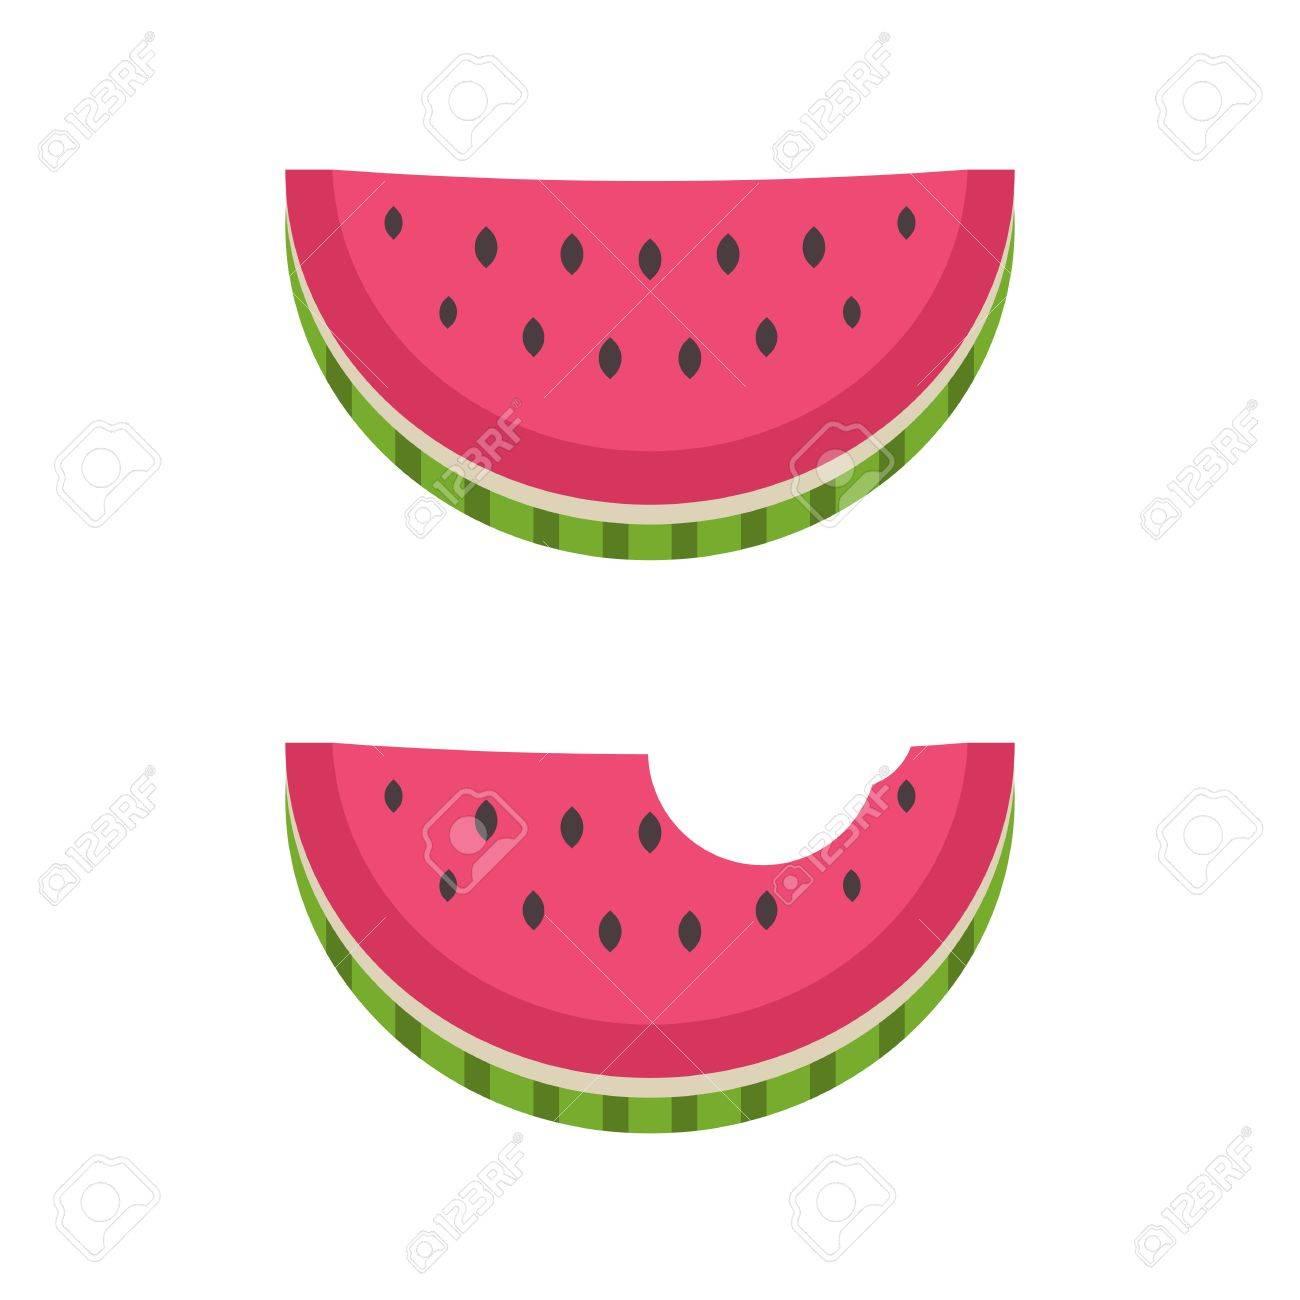 watermelon flat design icon water melon bitten piece cartoon rh 123rf com Watermelon Slice Vector Pineapple Vector